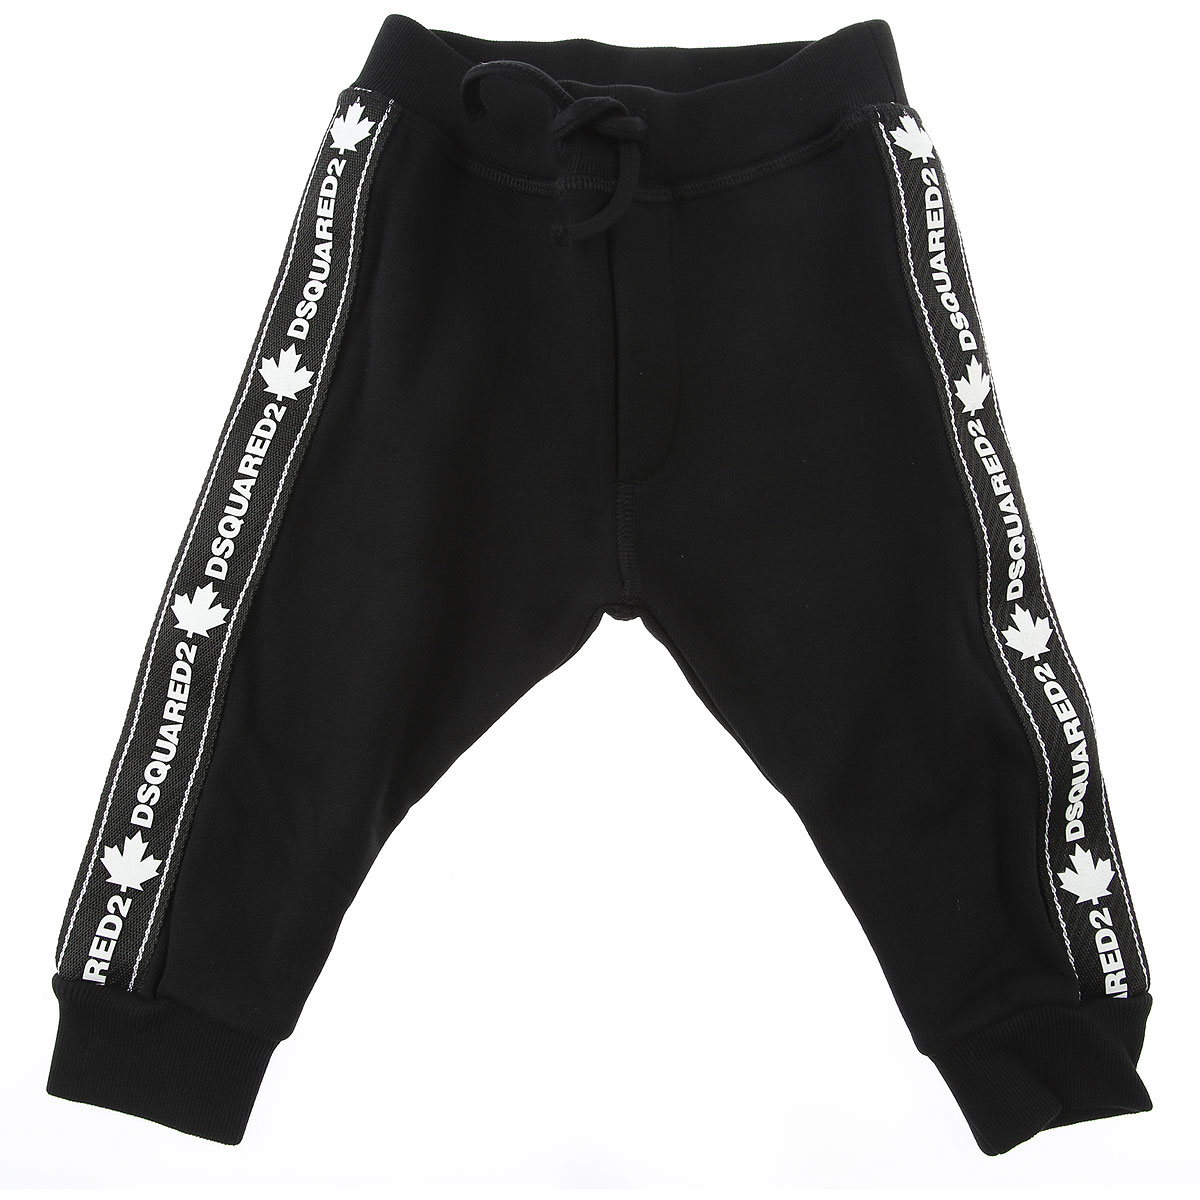 Dsquared2 Baby Sweatpants for Boys On Sale, Black, Cotton, 2019, 18 M 3Y